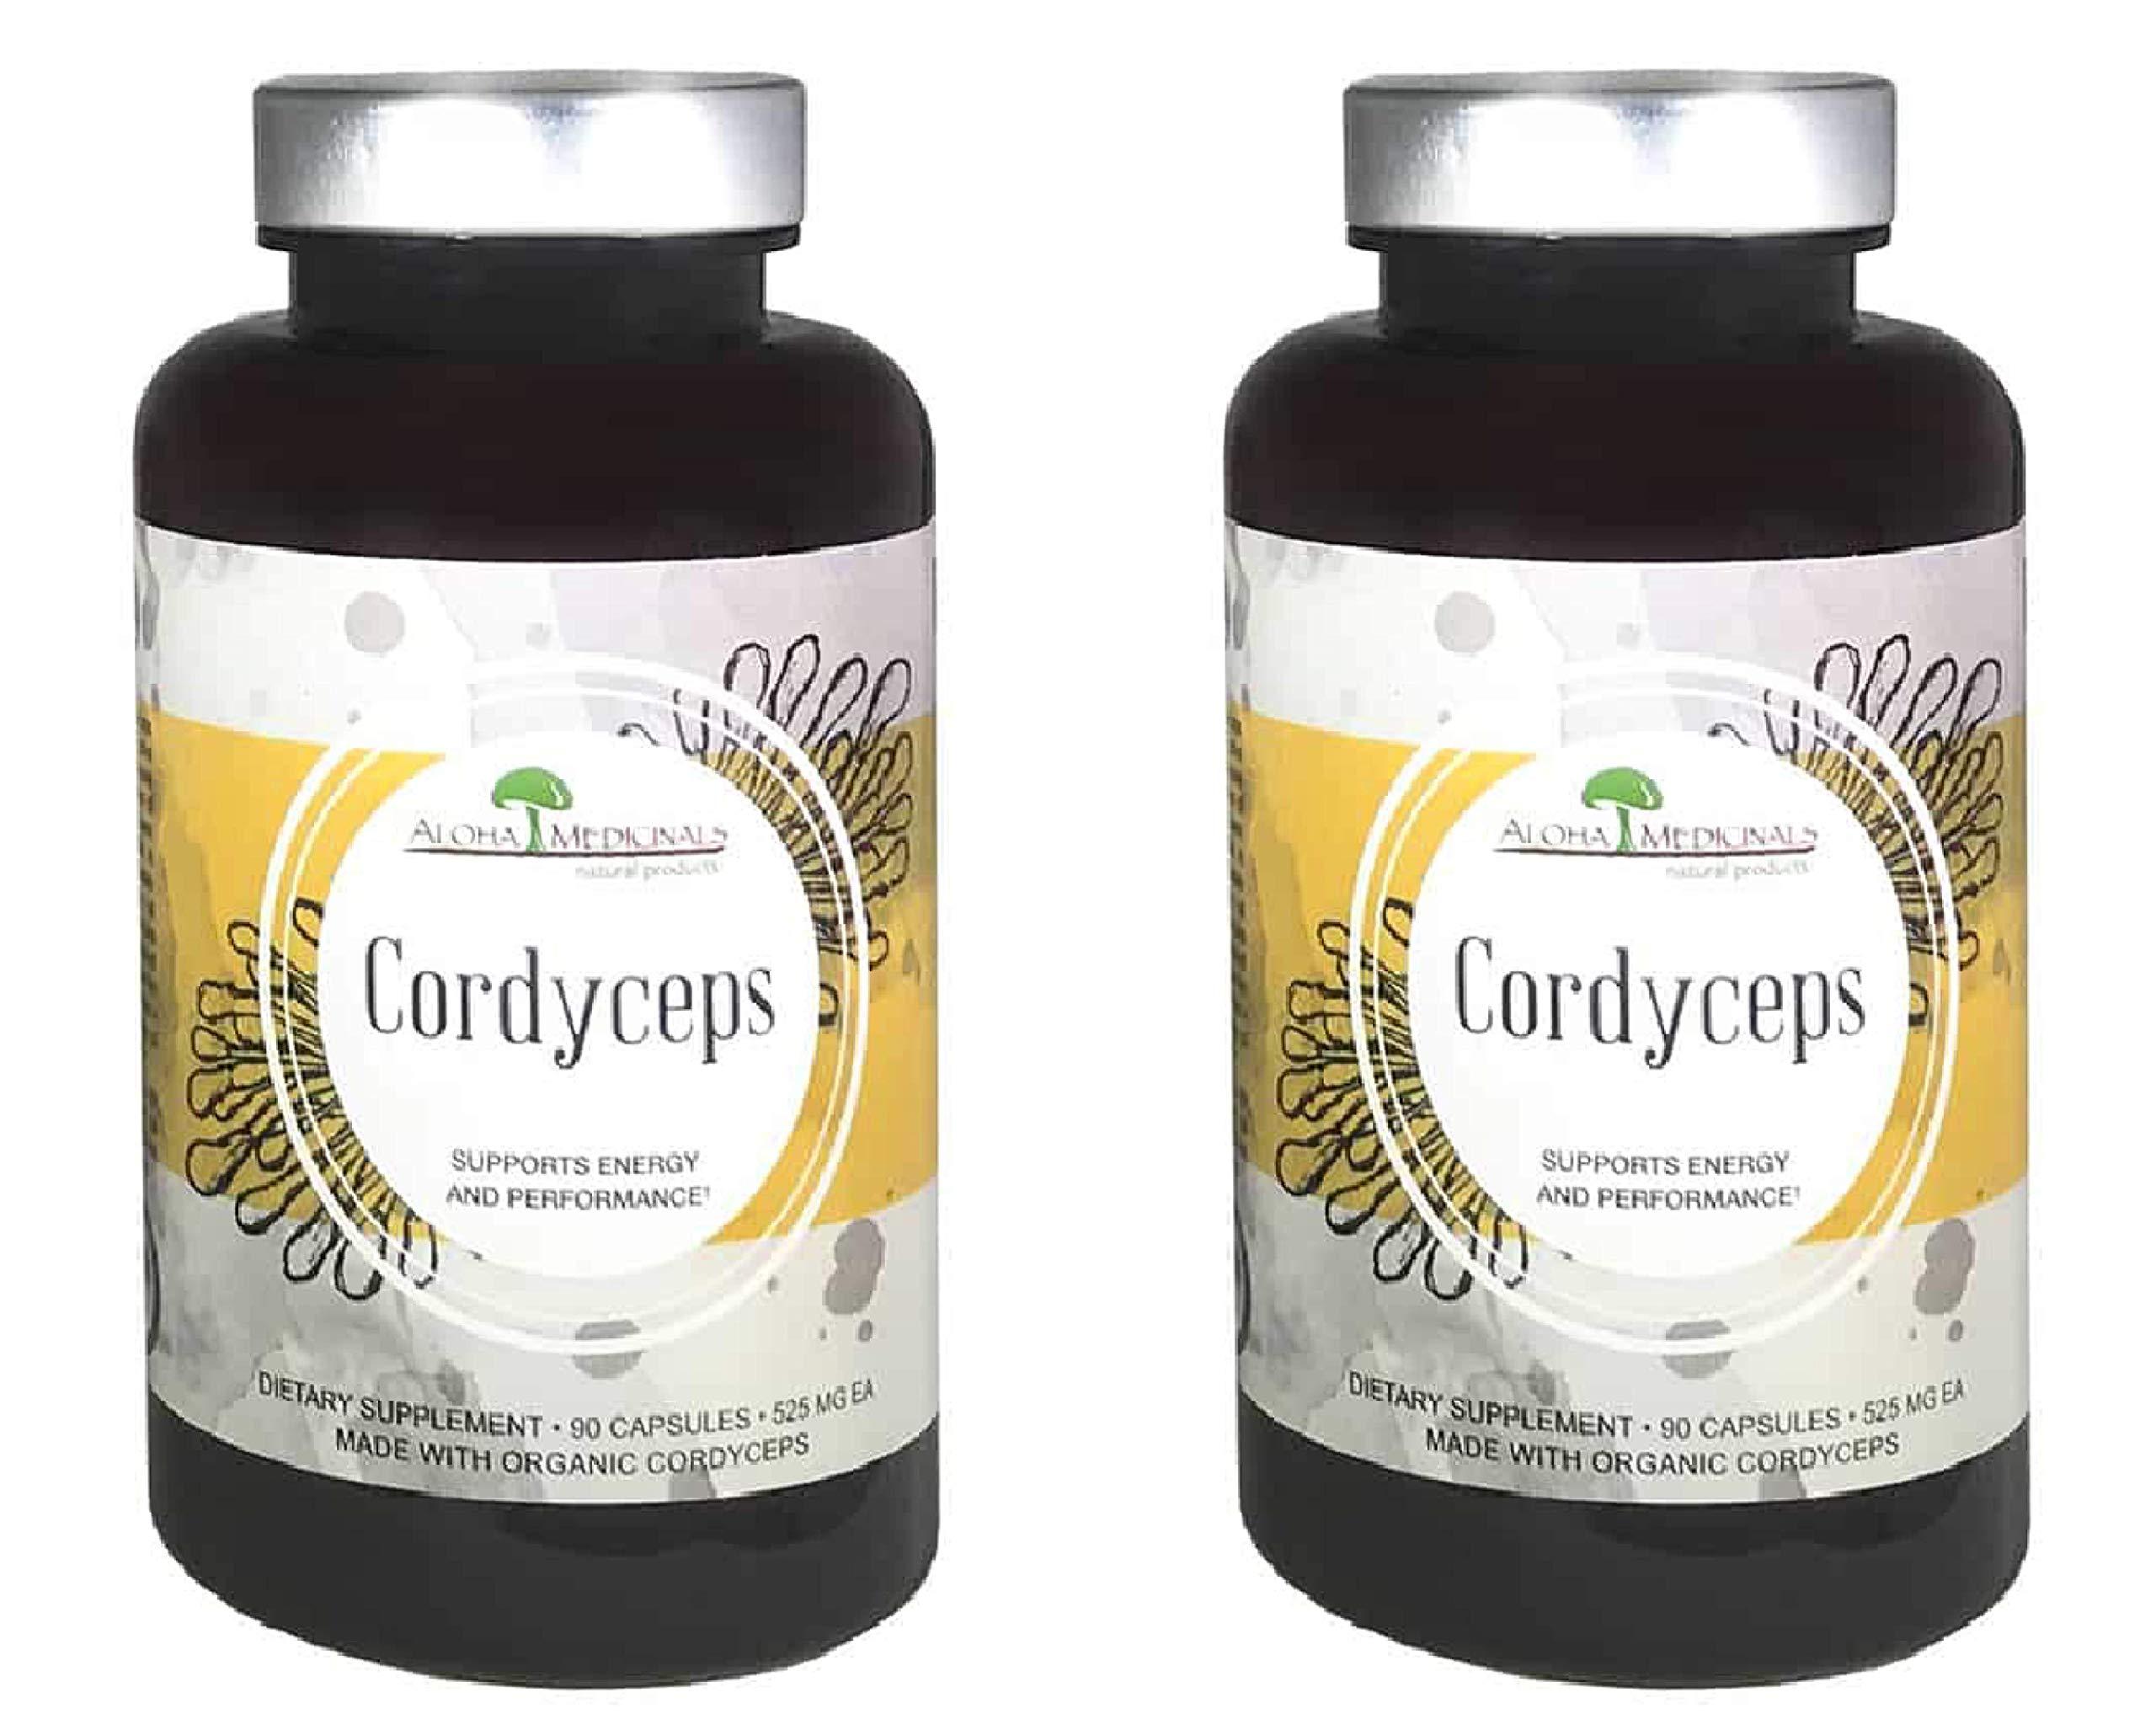 Aloha Medicinals - Pure Cordyceps - Certified Organic Mushrooms – Cordyceps Militaris – Cordyceps Sinensis - Supports Immunity, Energy and Stamina - 525mg - 90 Vegetarian Capsules (2 Pack)